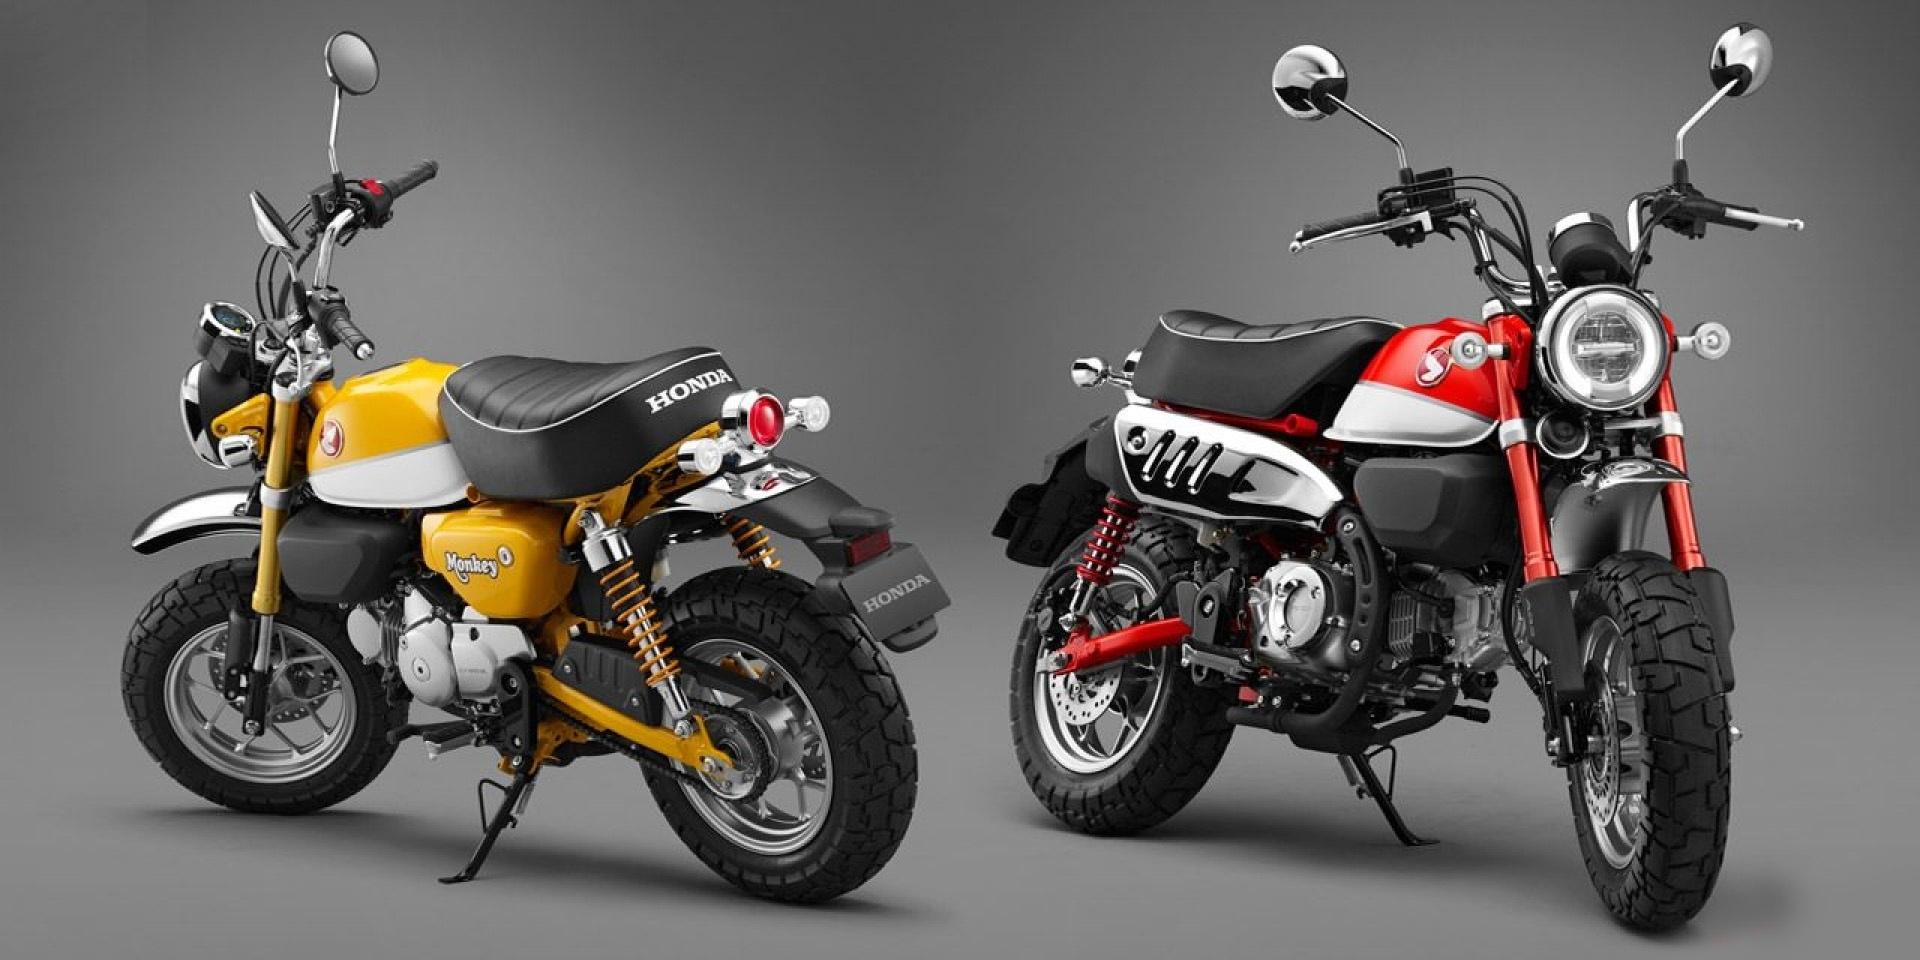 Forza 300預售在即,Honda Monkey 125確定引進 Goldwing、Africa Twin第三季發表!